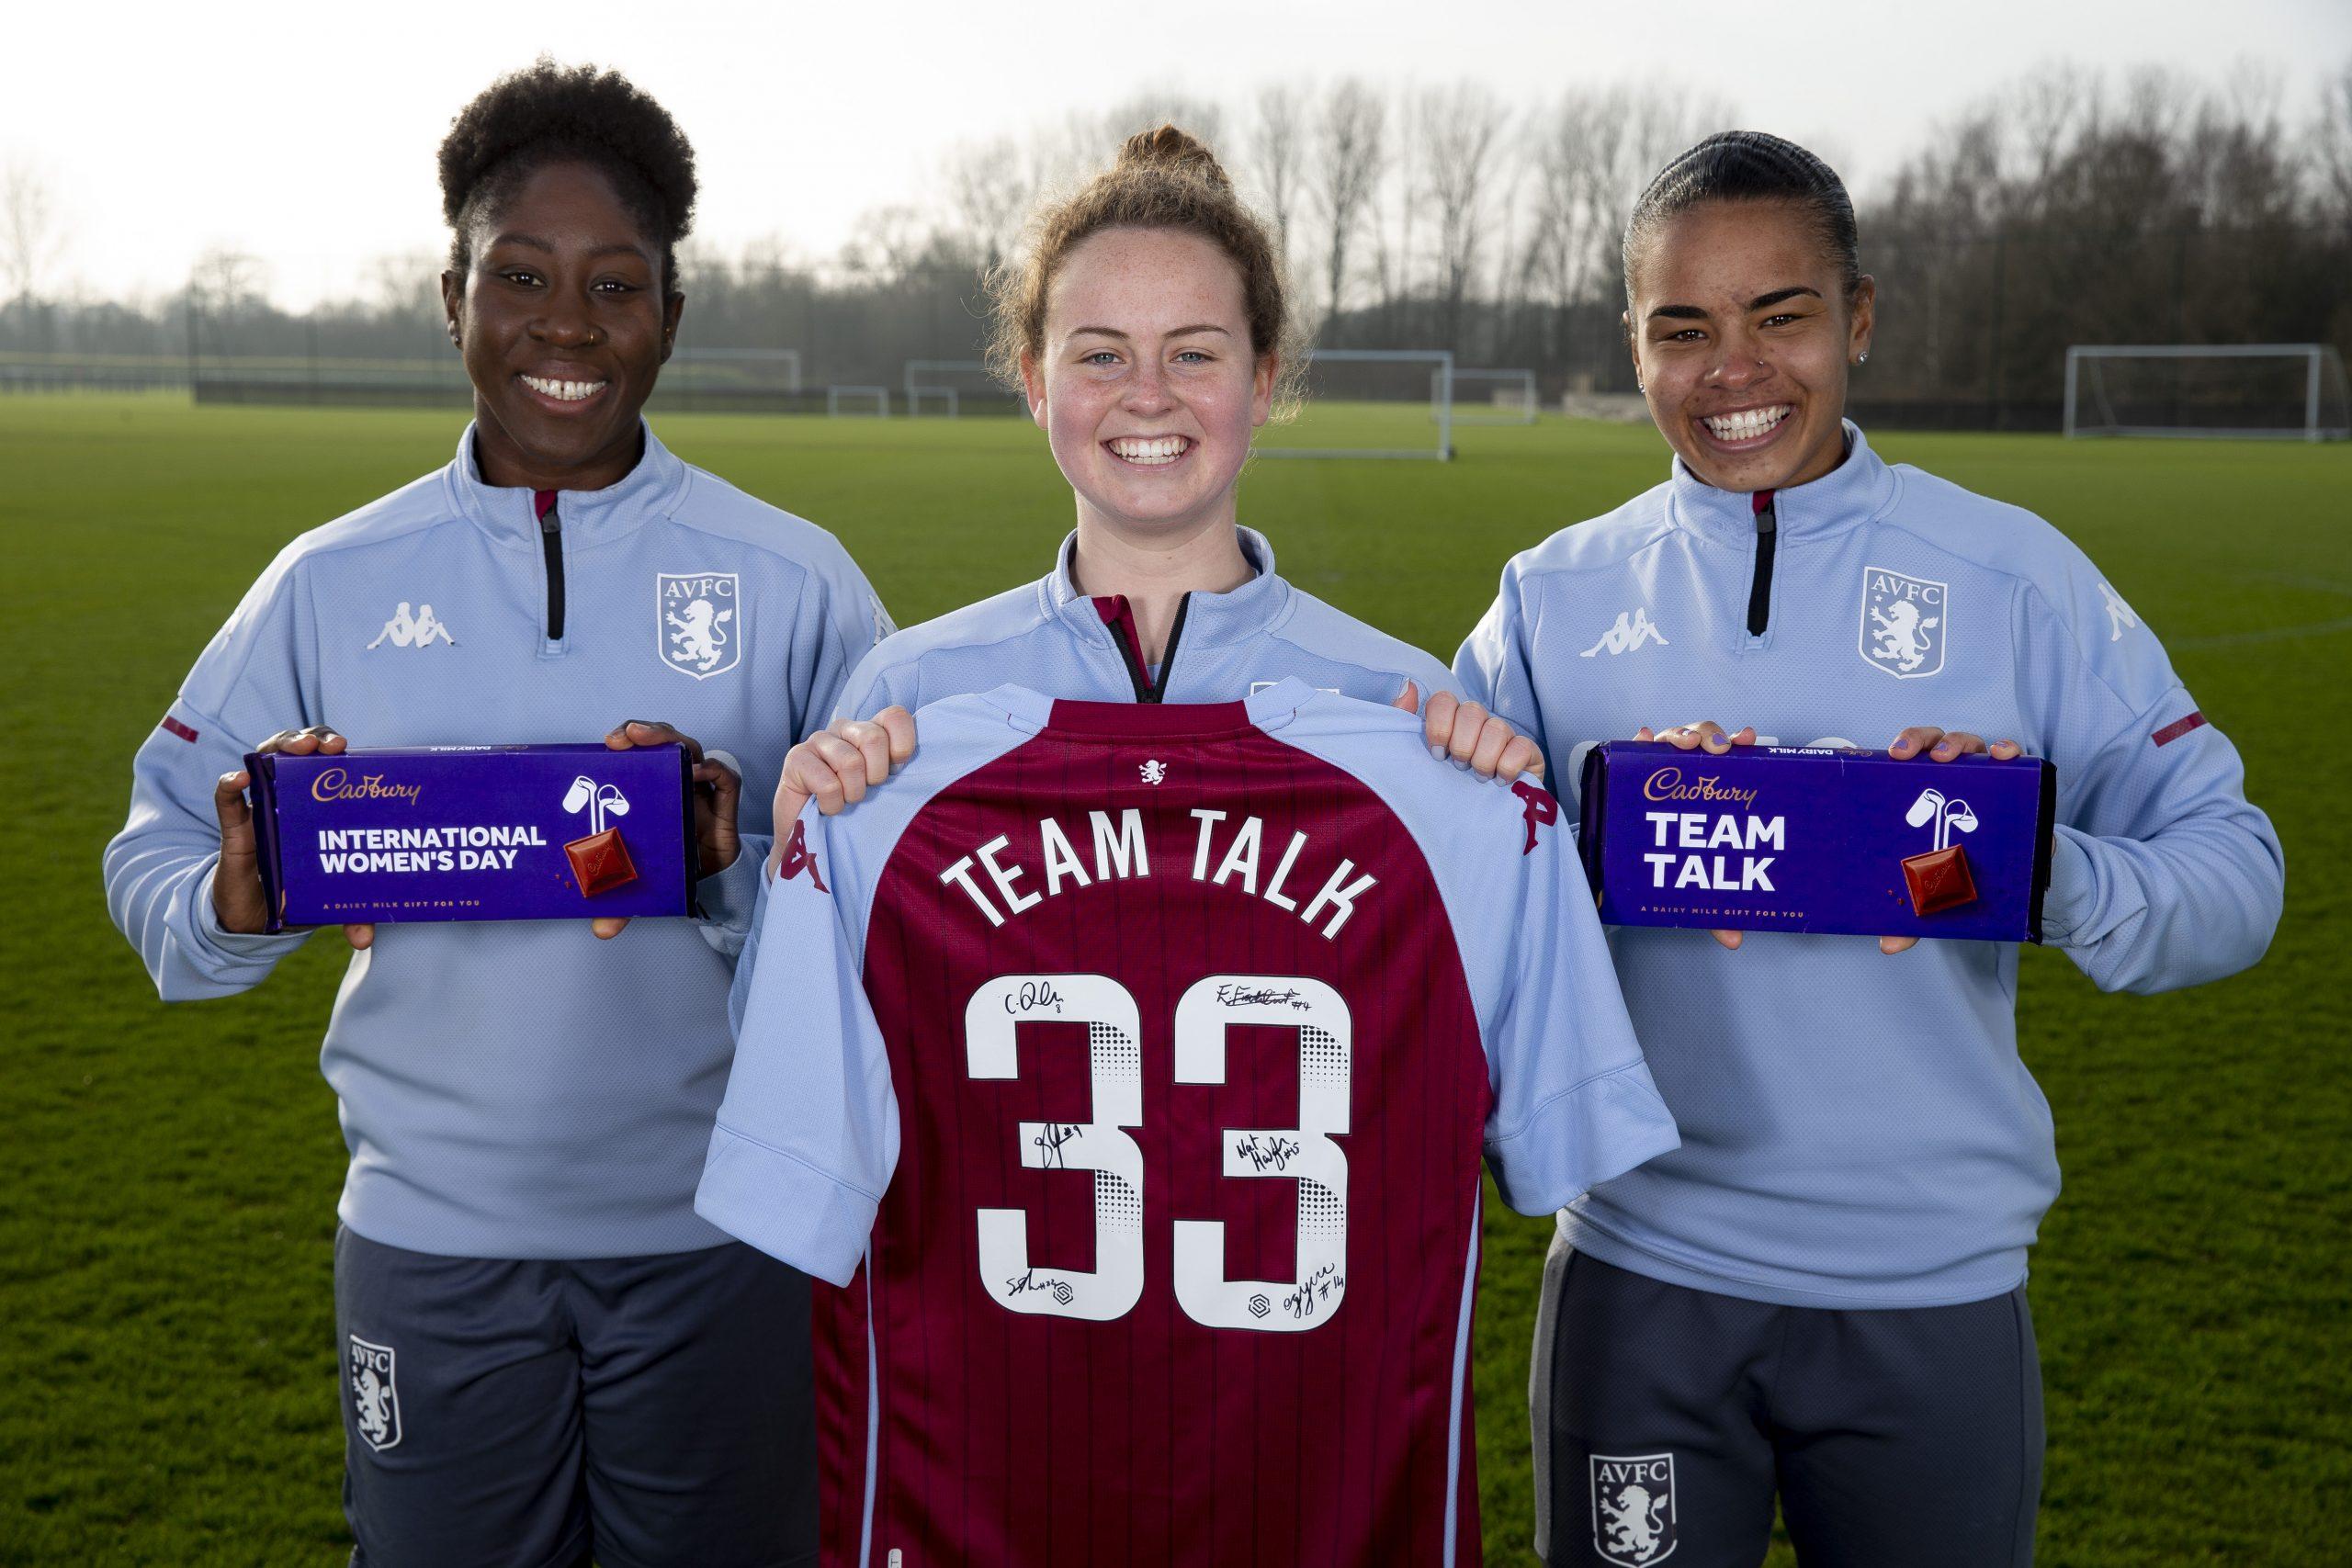 Aston Villa x Cadbury Team Talk (4)